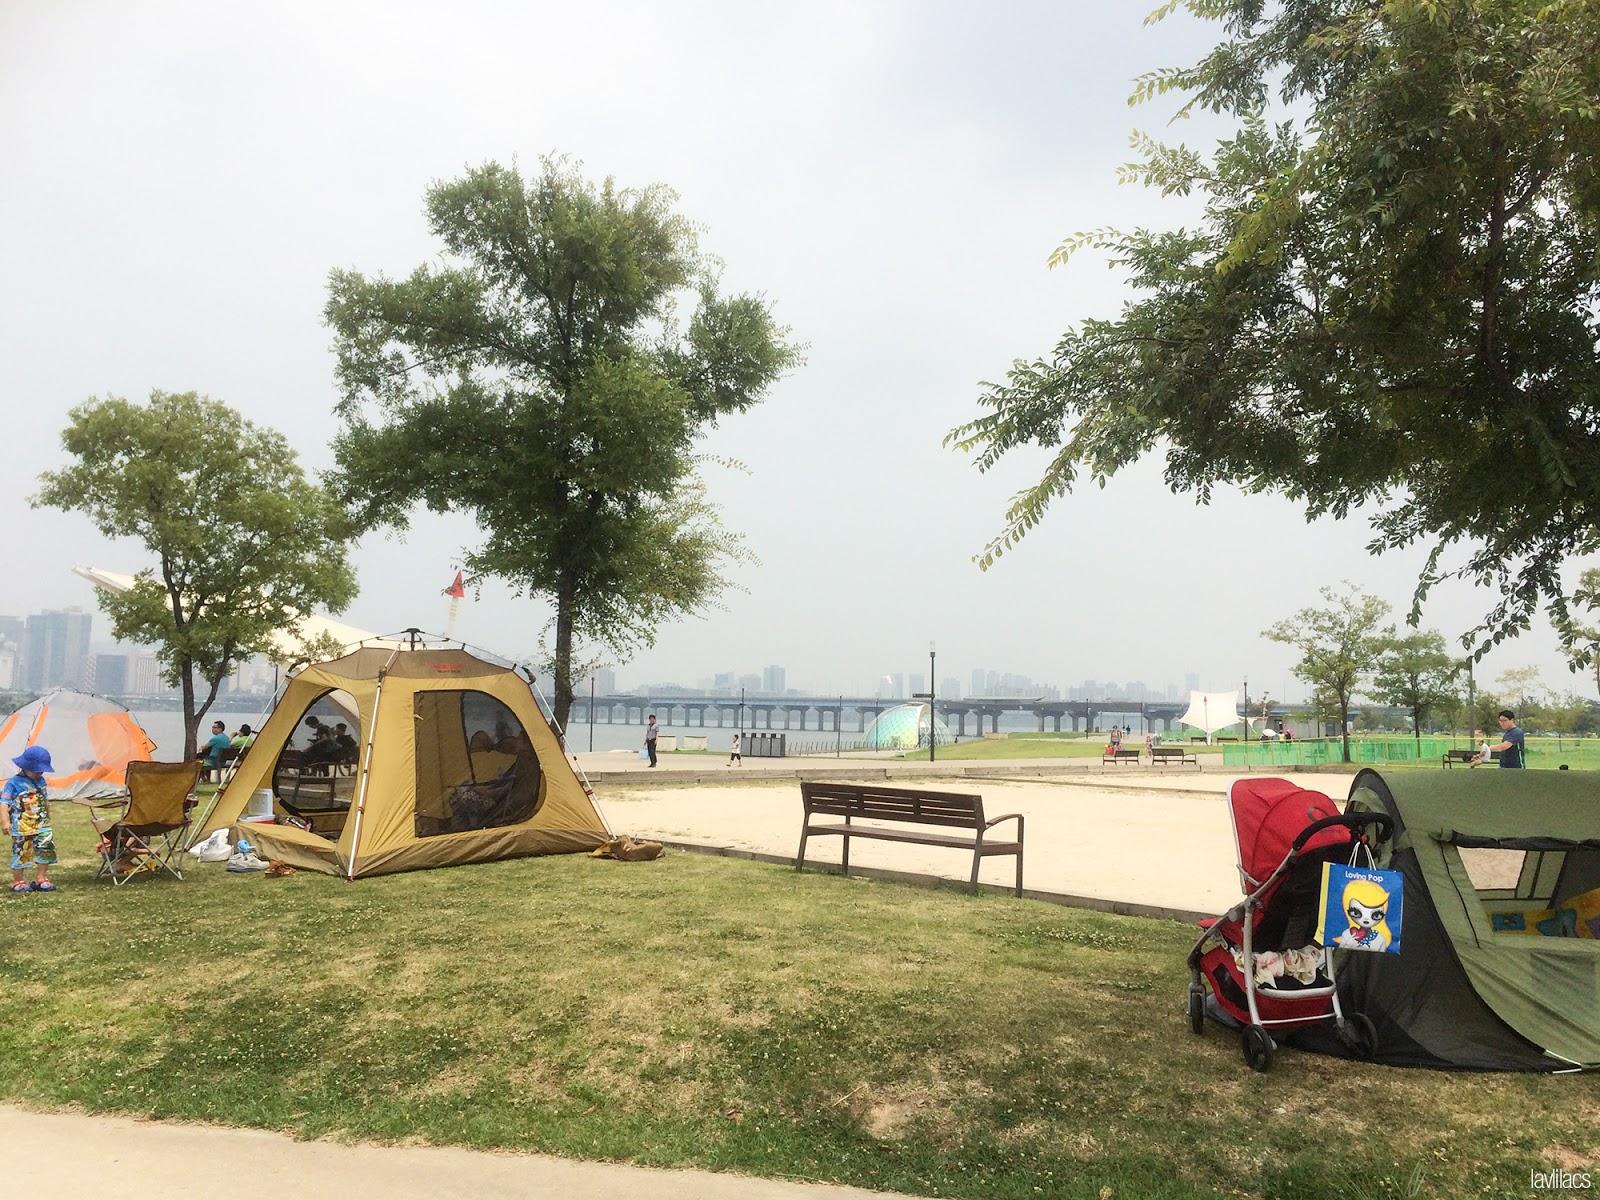 Seoul, Korea - Summer Study Abroad 2014 - Yeouido Park - Han River - camping